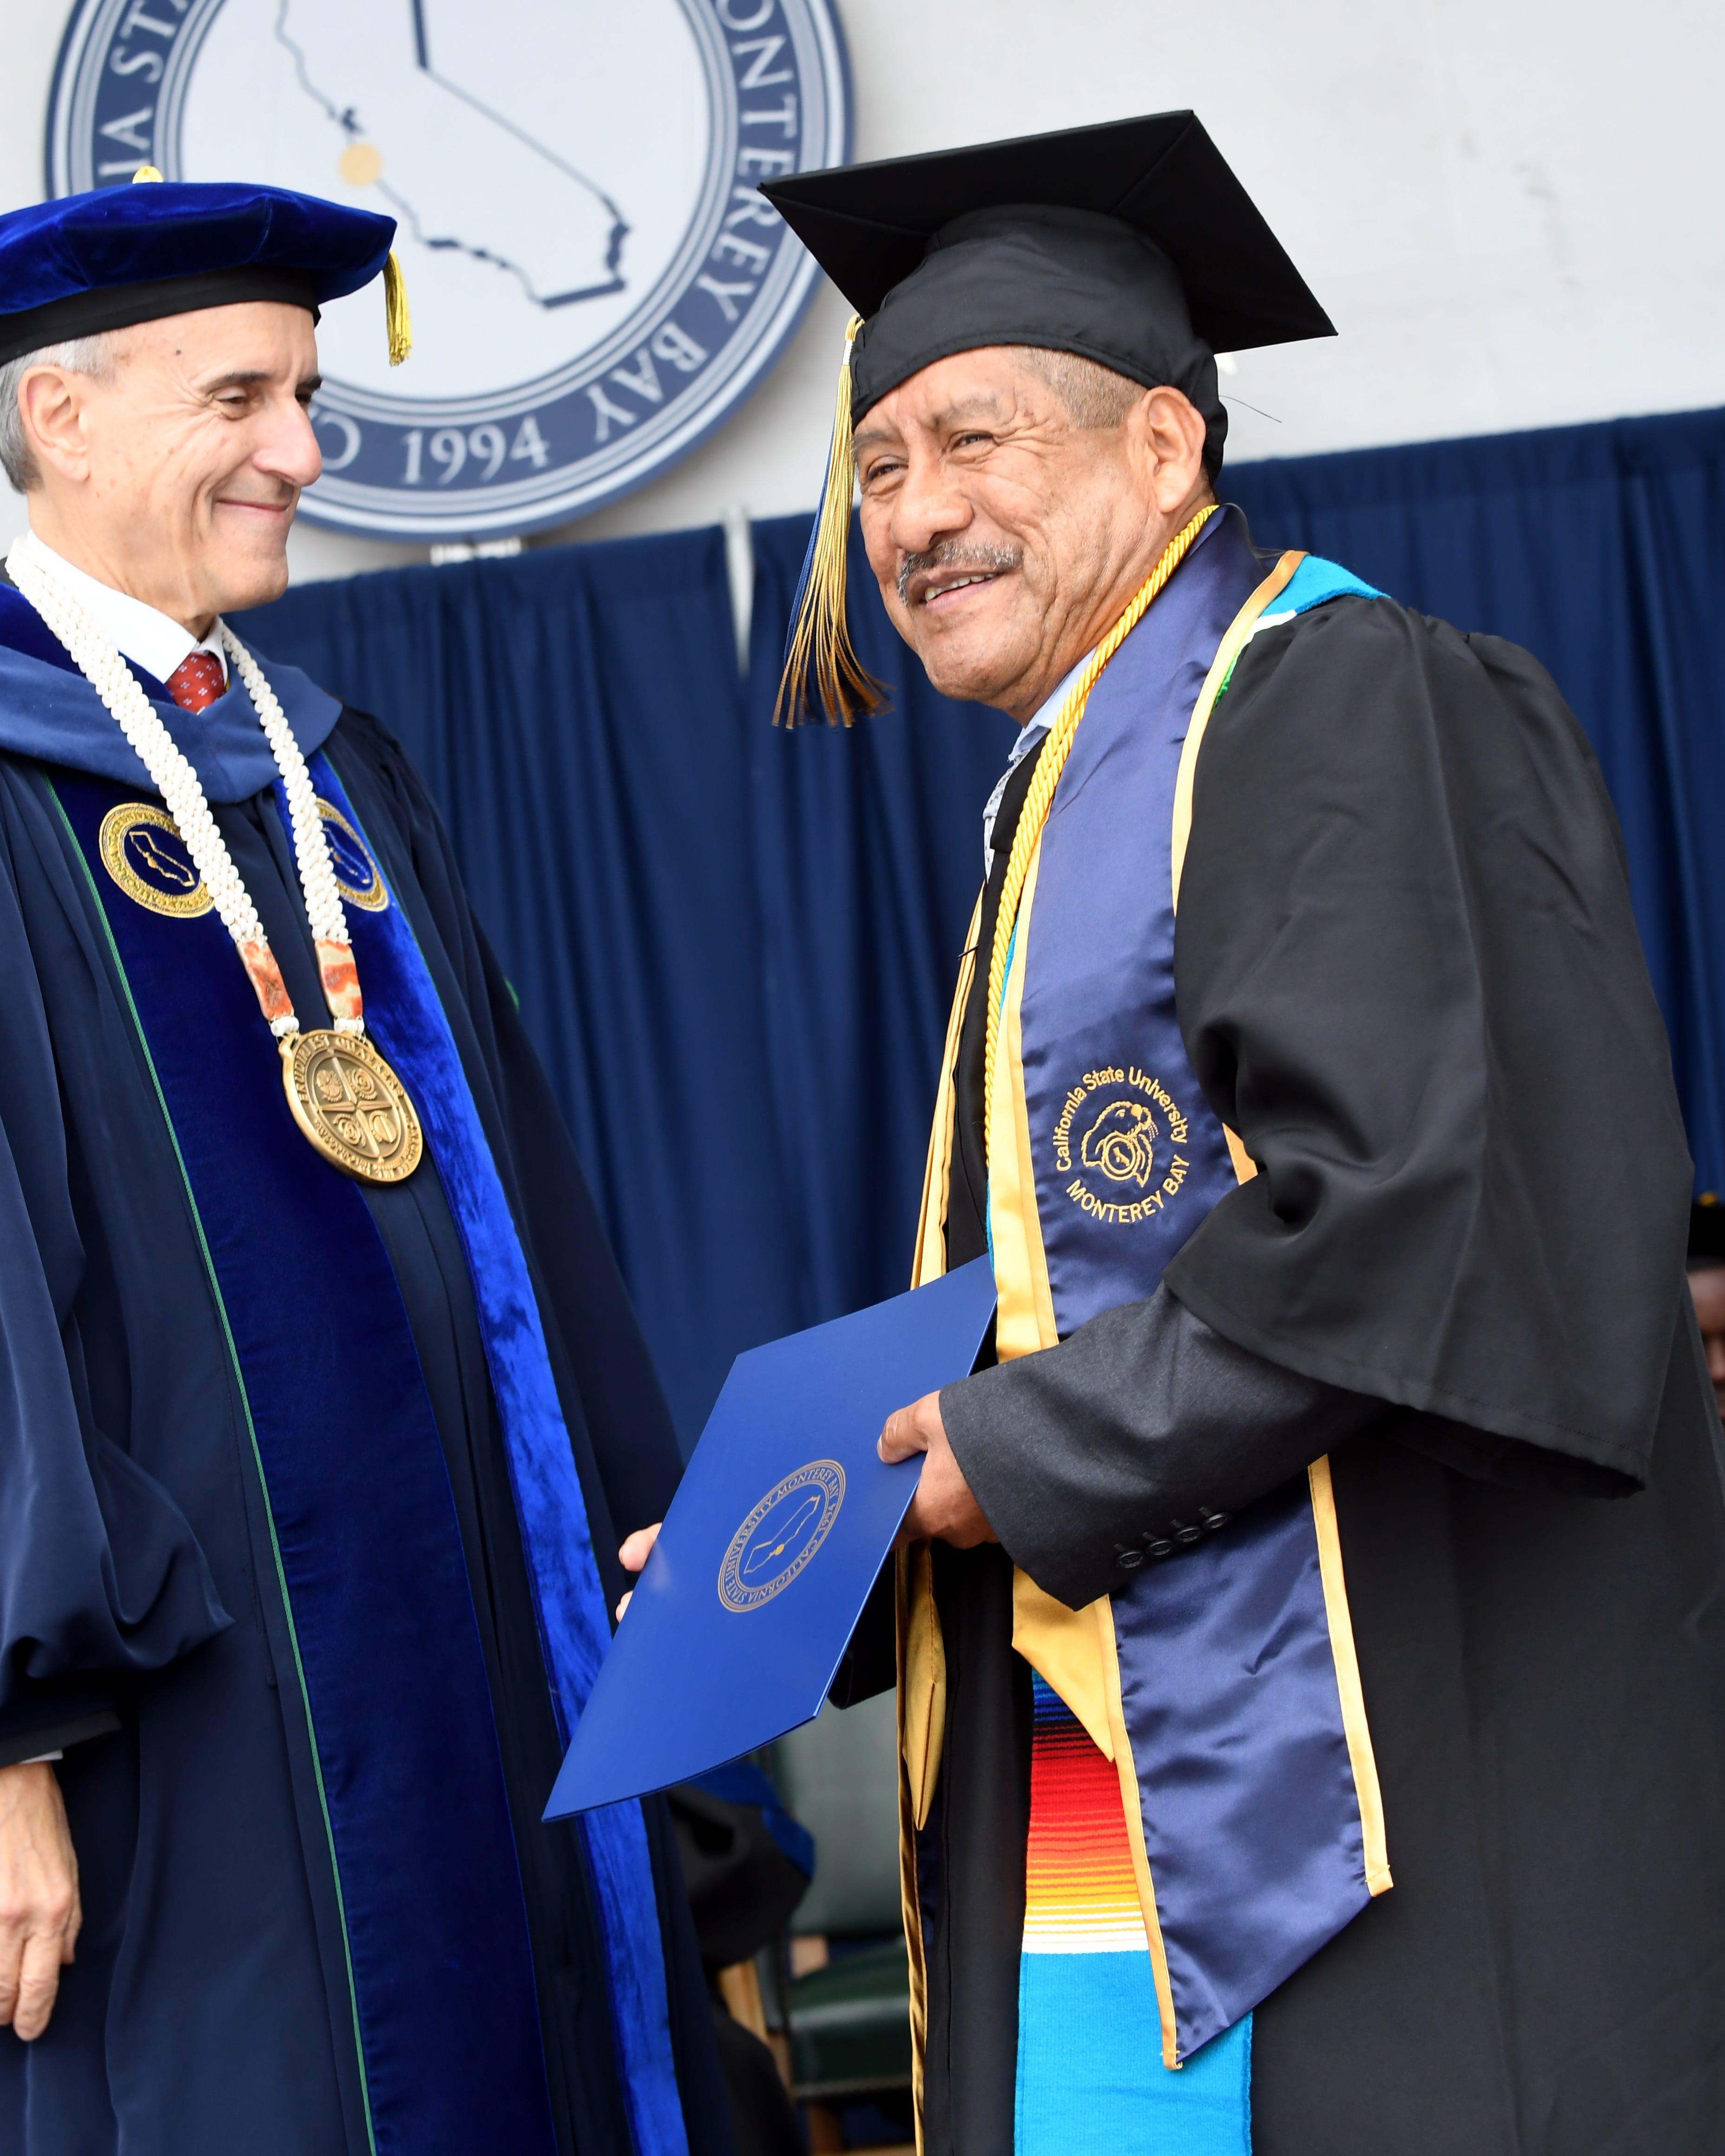 Adolfo González receives his diploma Saturday, May 18, 2019.